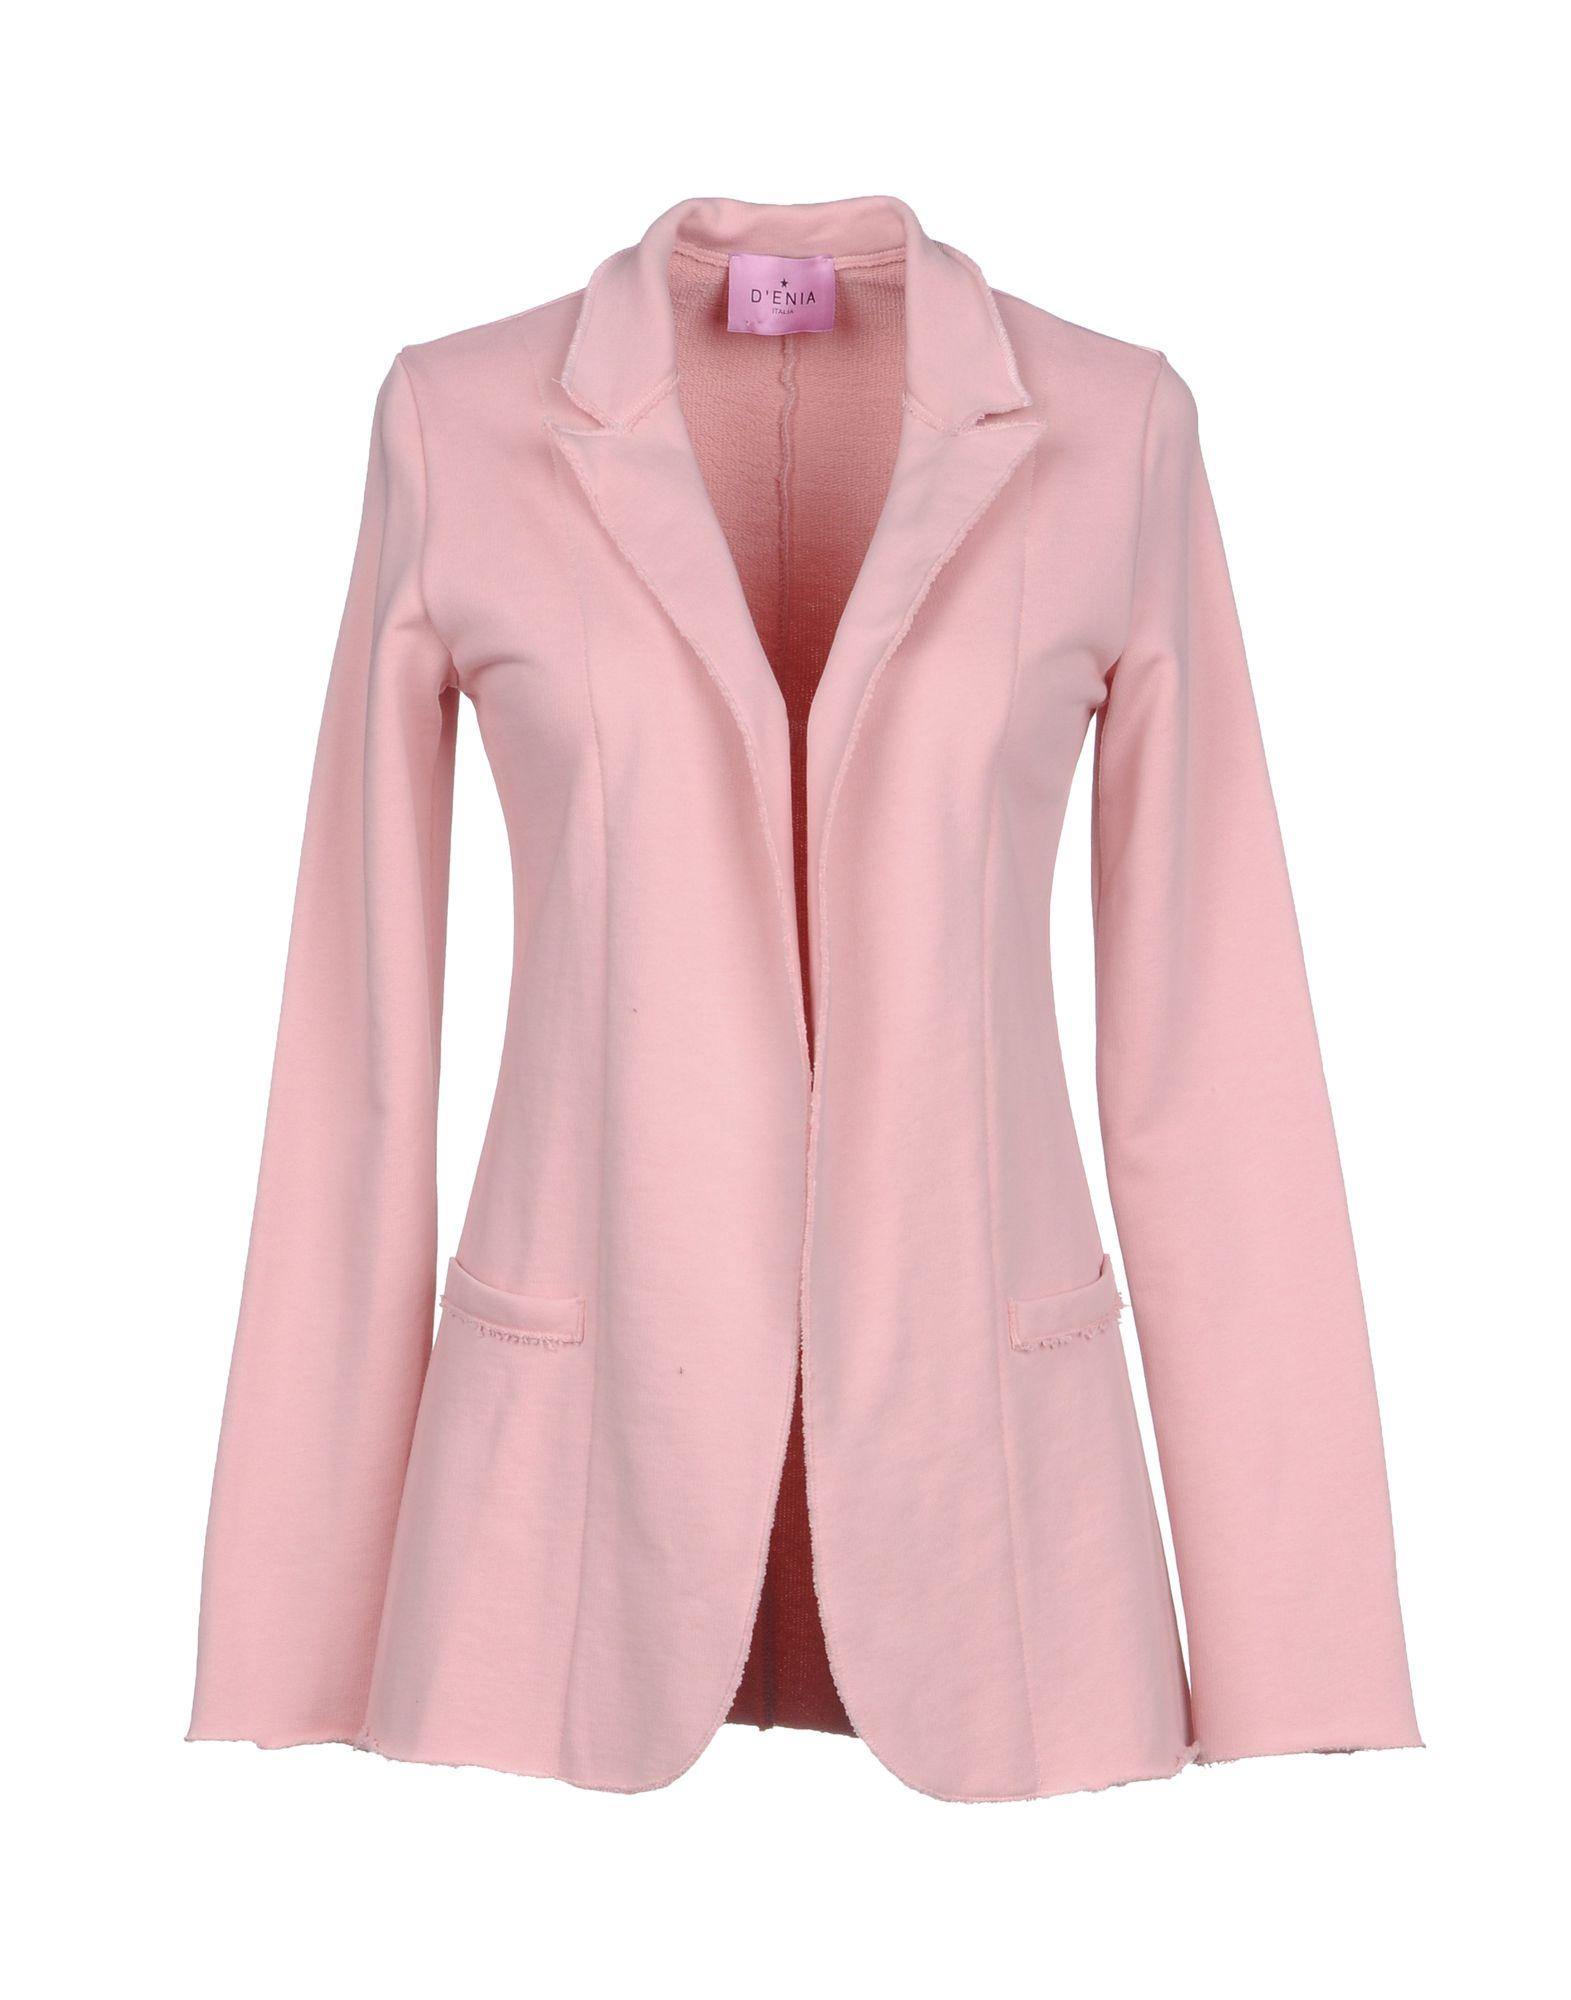 D'ENIA Blazer in Pink